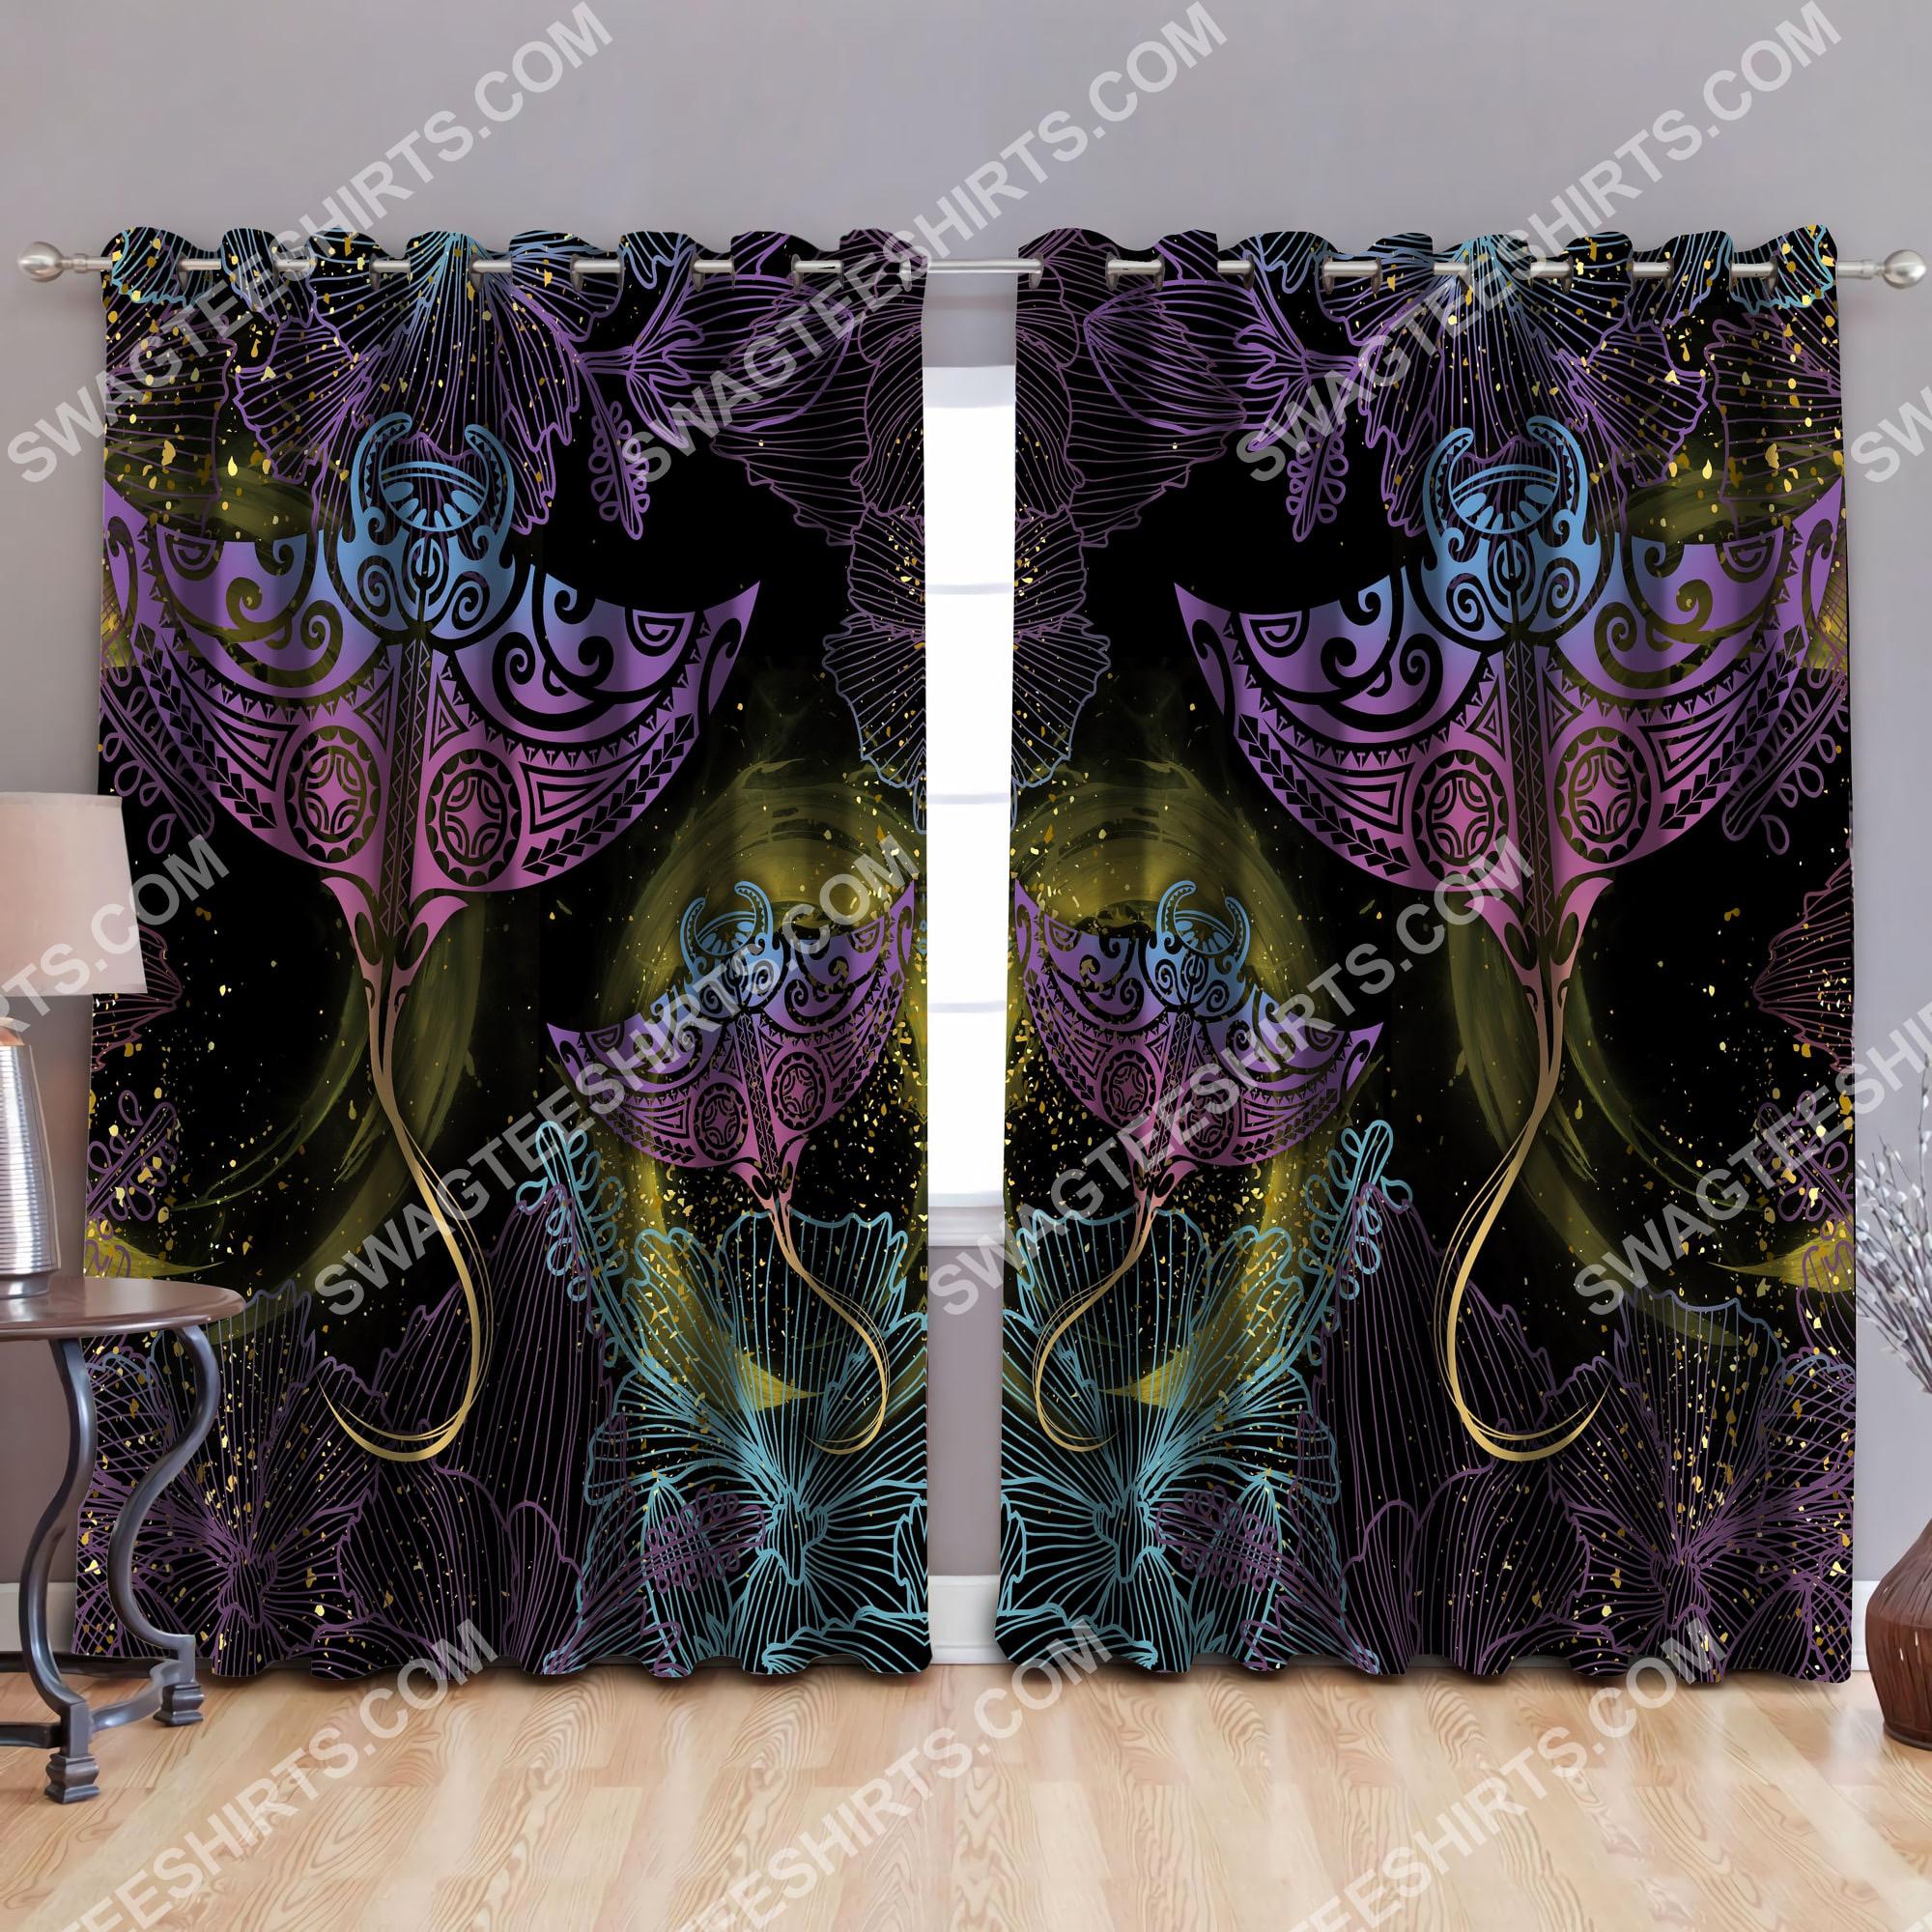 polynesian beautiful ray galaxy all over printed window curtains 2(1) - Copy